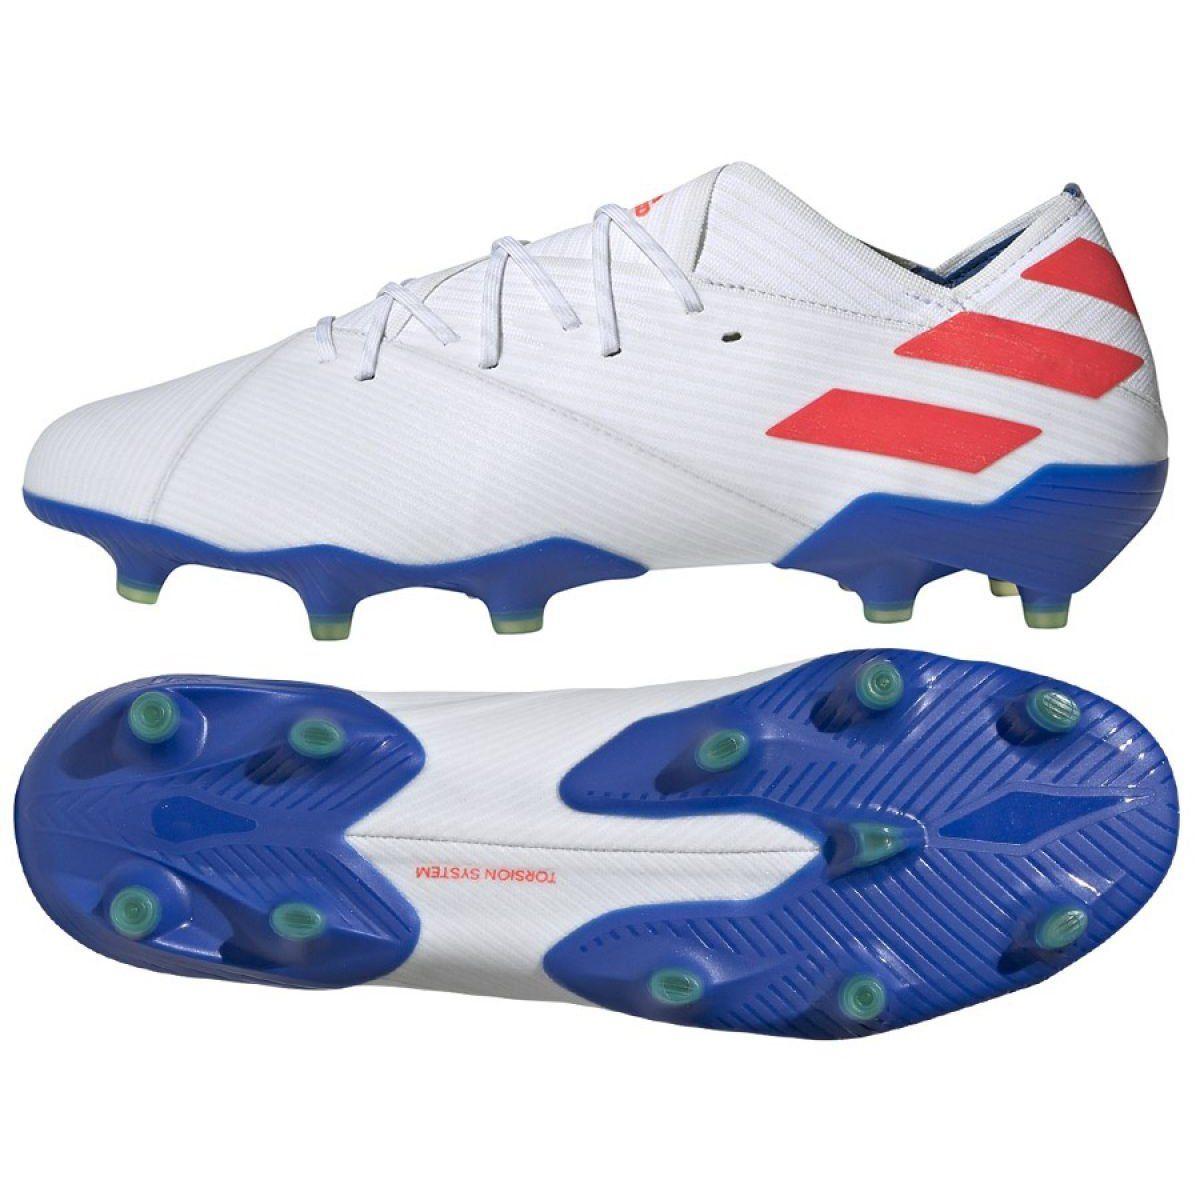 Football Boots Adidas Nemeziz Messi 19 1 Fg M F34402 White White Football Boots Adidas Football Soccer Cleats